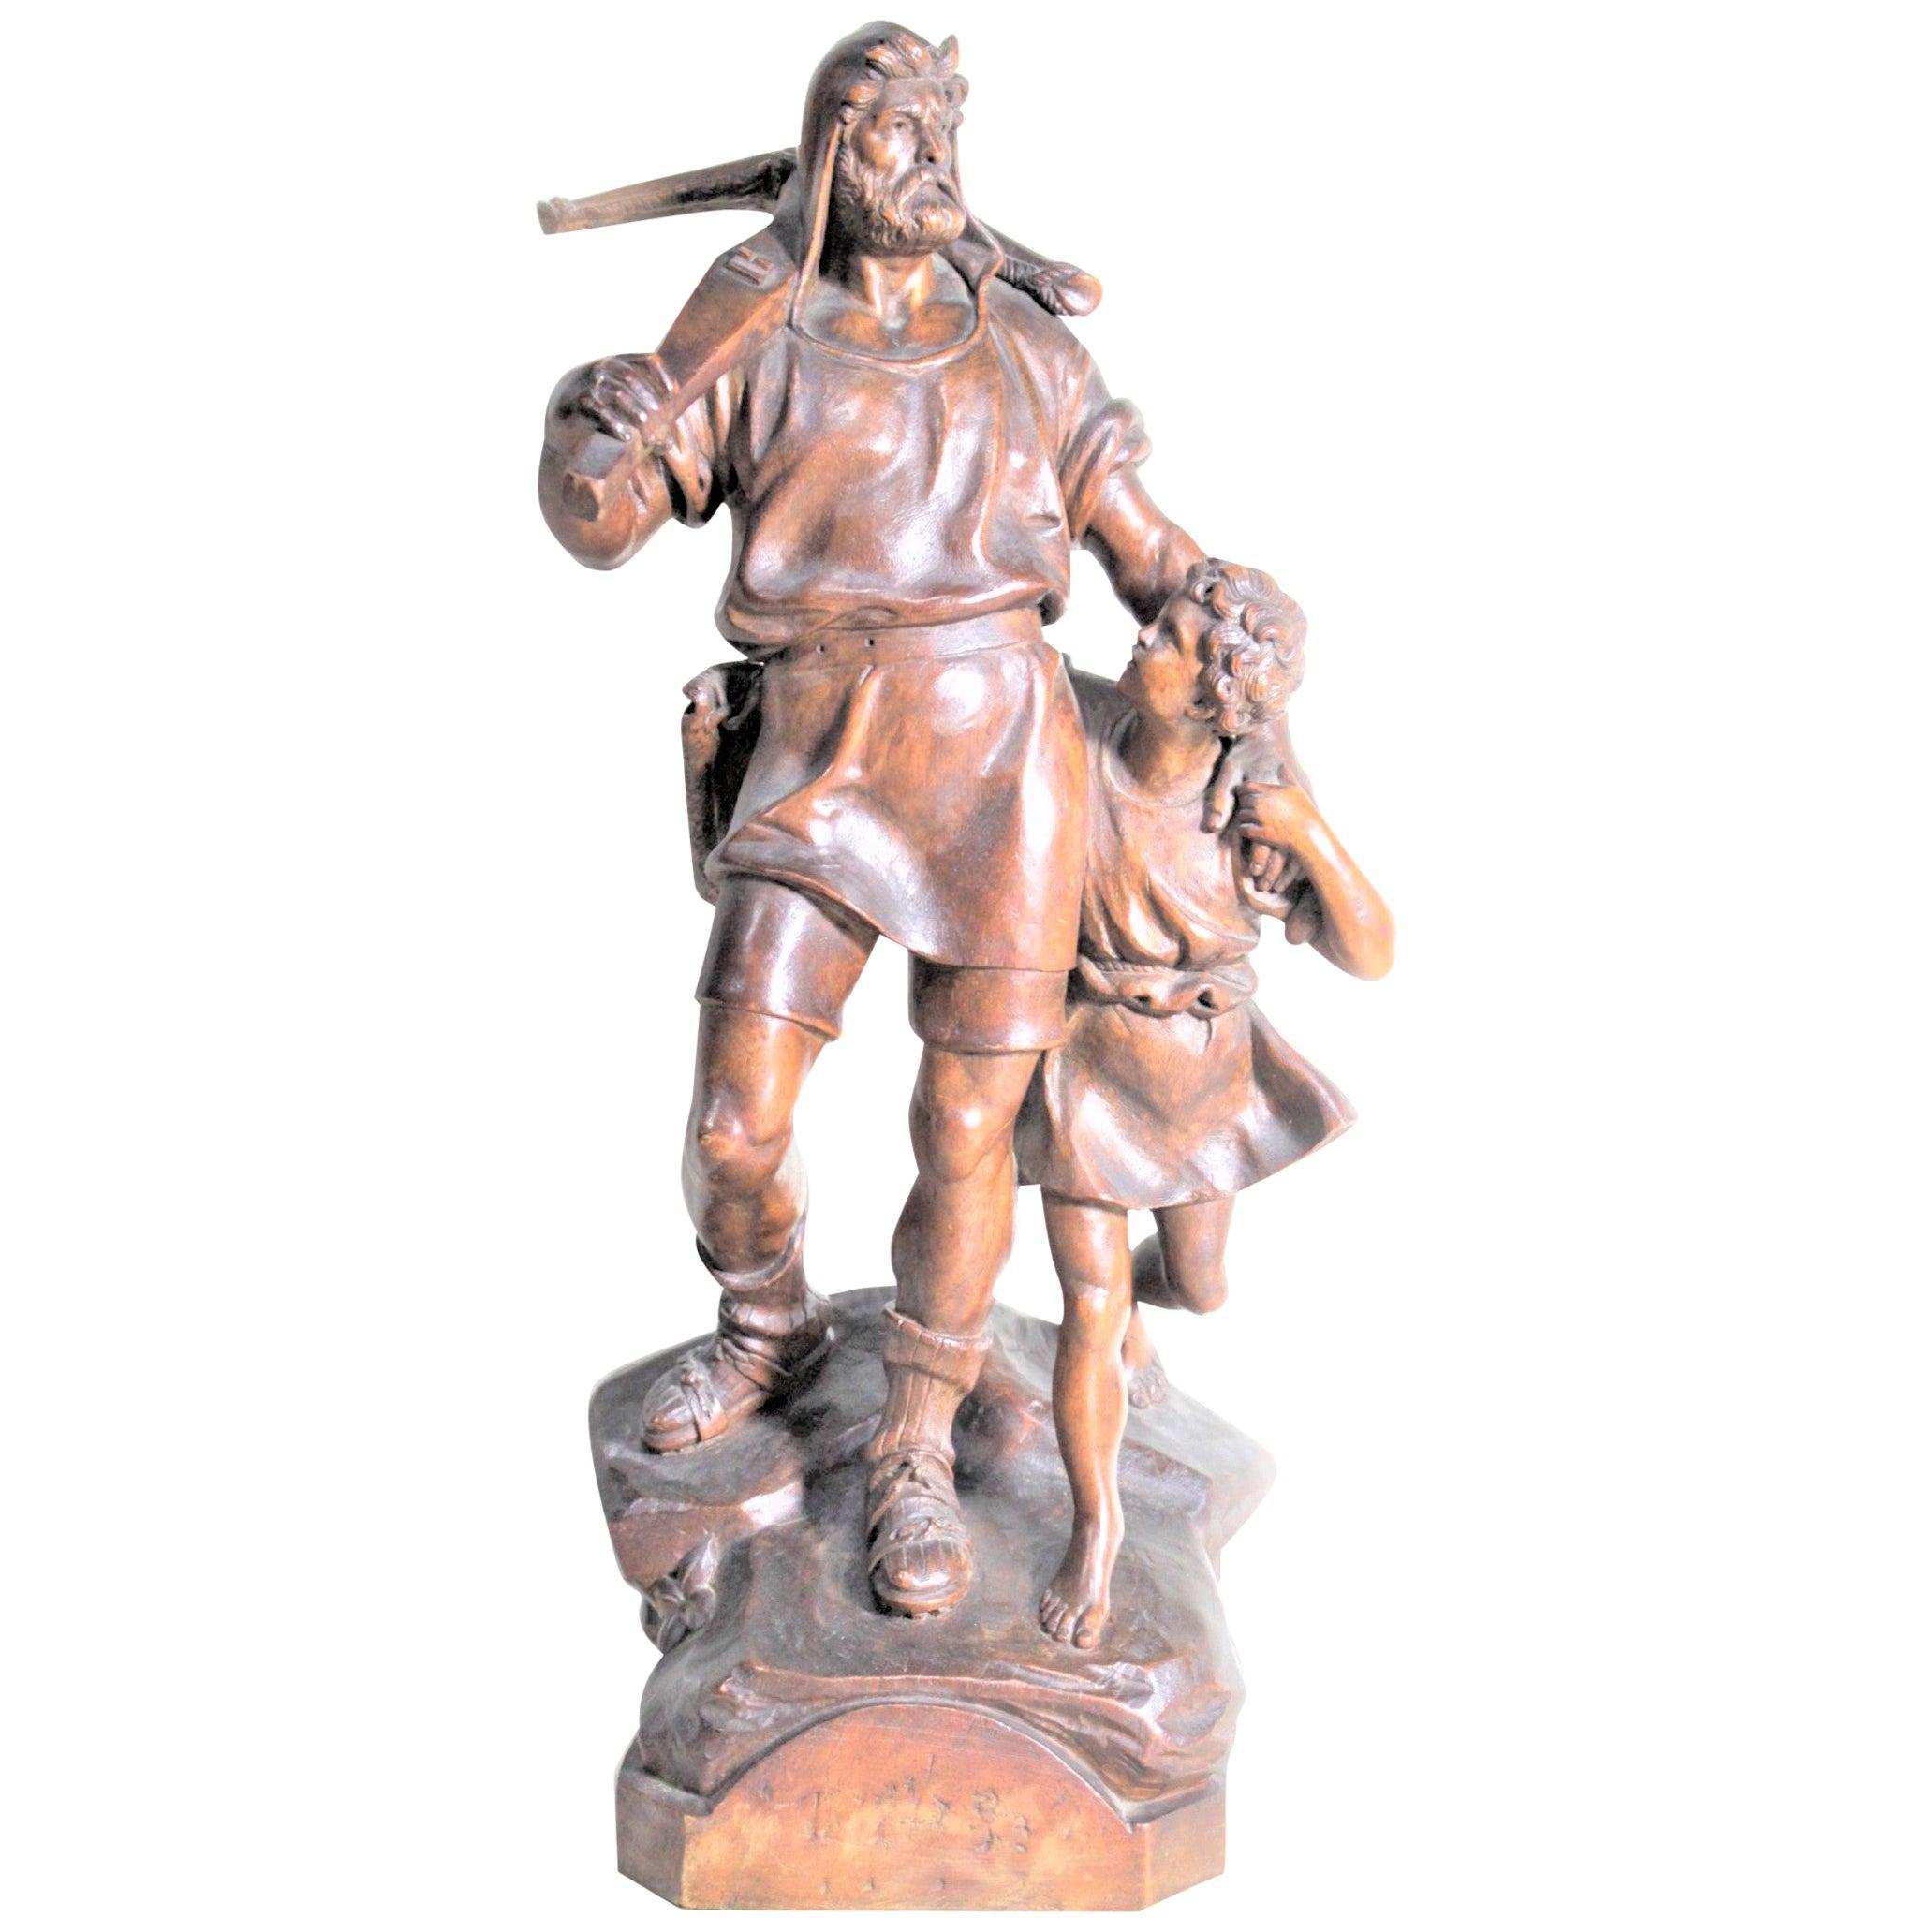 Antique Folk Art Hand Carved 'William Tell' & Boy Wooden Figurative Sculpture